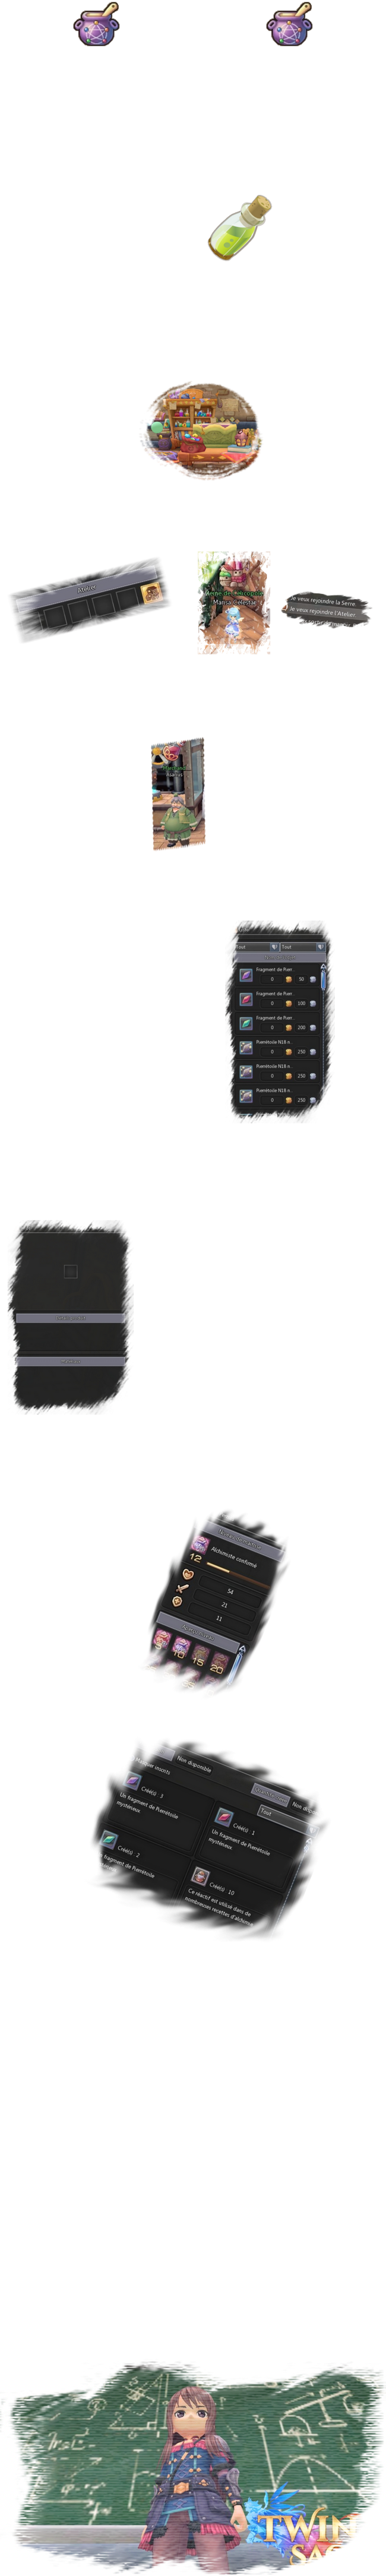 -Guide- L'alchimie